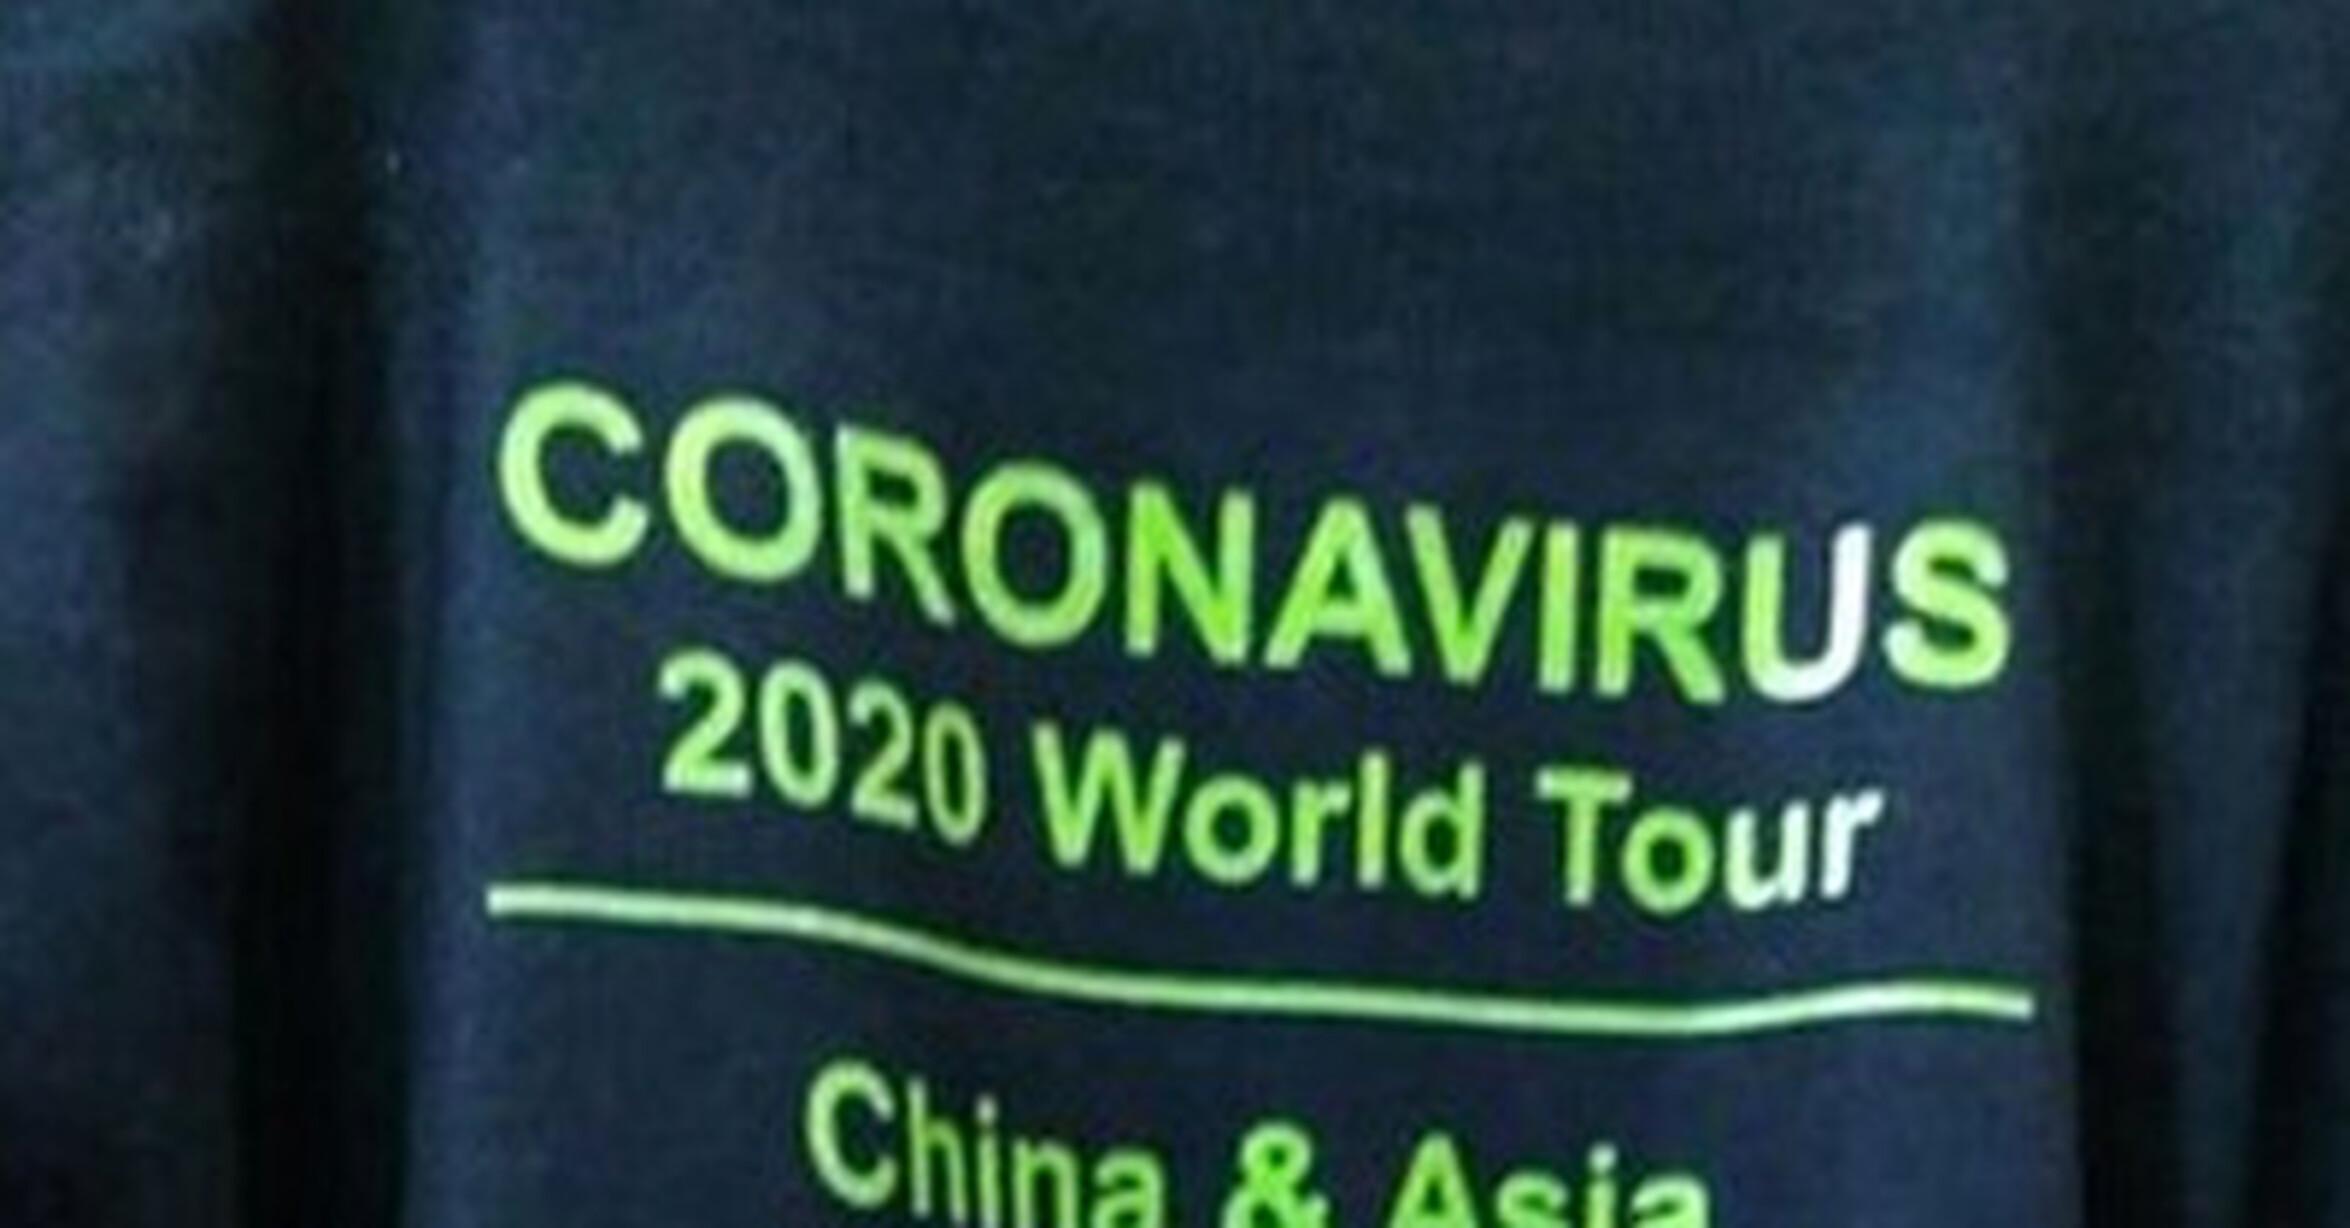 VEF_541611_00f0a1b4176a46389fa83b00a041ea25_twitter_ponen_a_la_venta_las_camisetas_del_coronavirus_2020_world_tour_comprala_antes_de_que_te_mate_thumb_fb